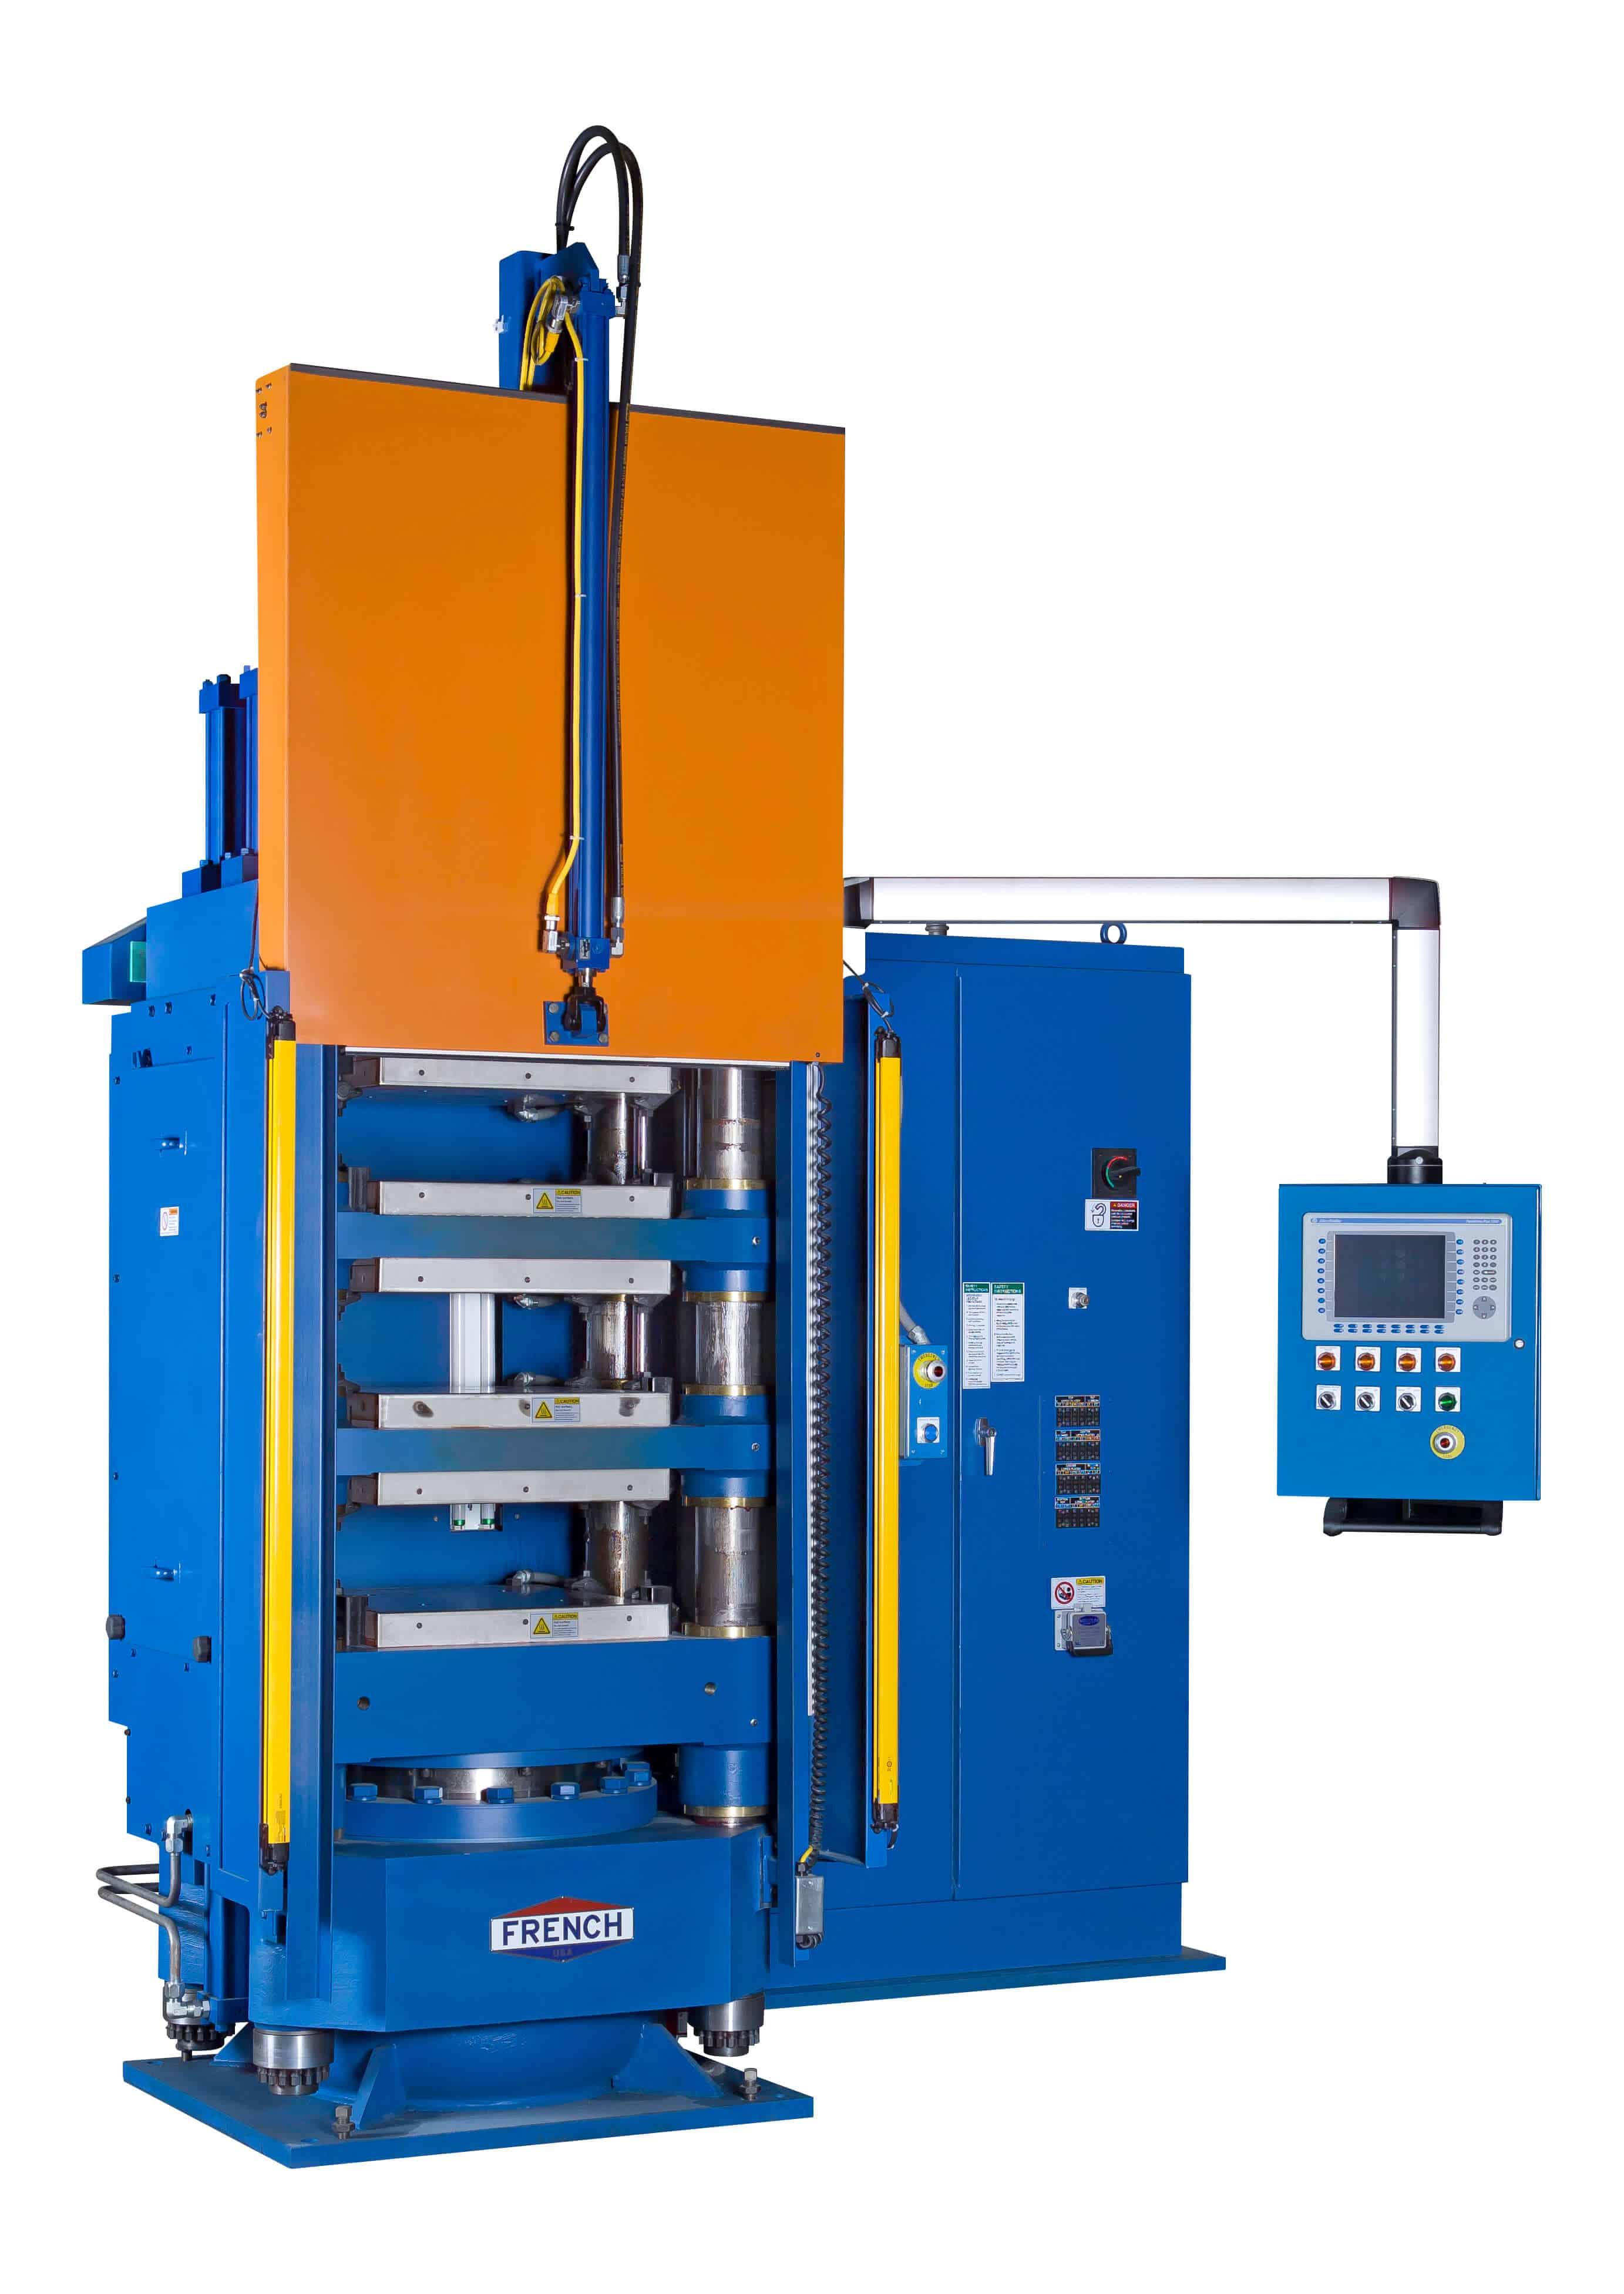 Adjustable Compression Molding Press